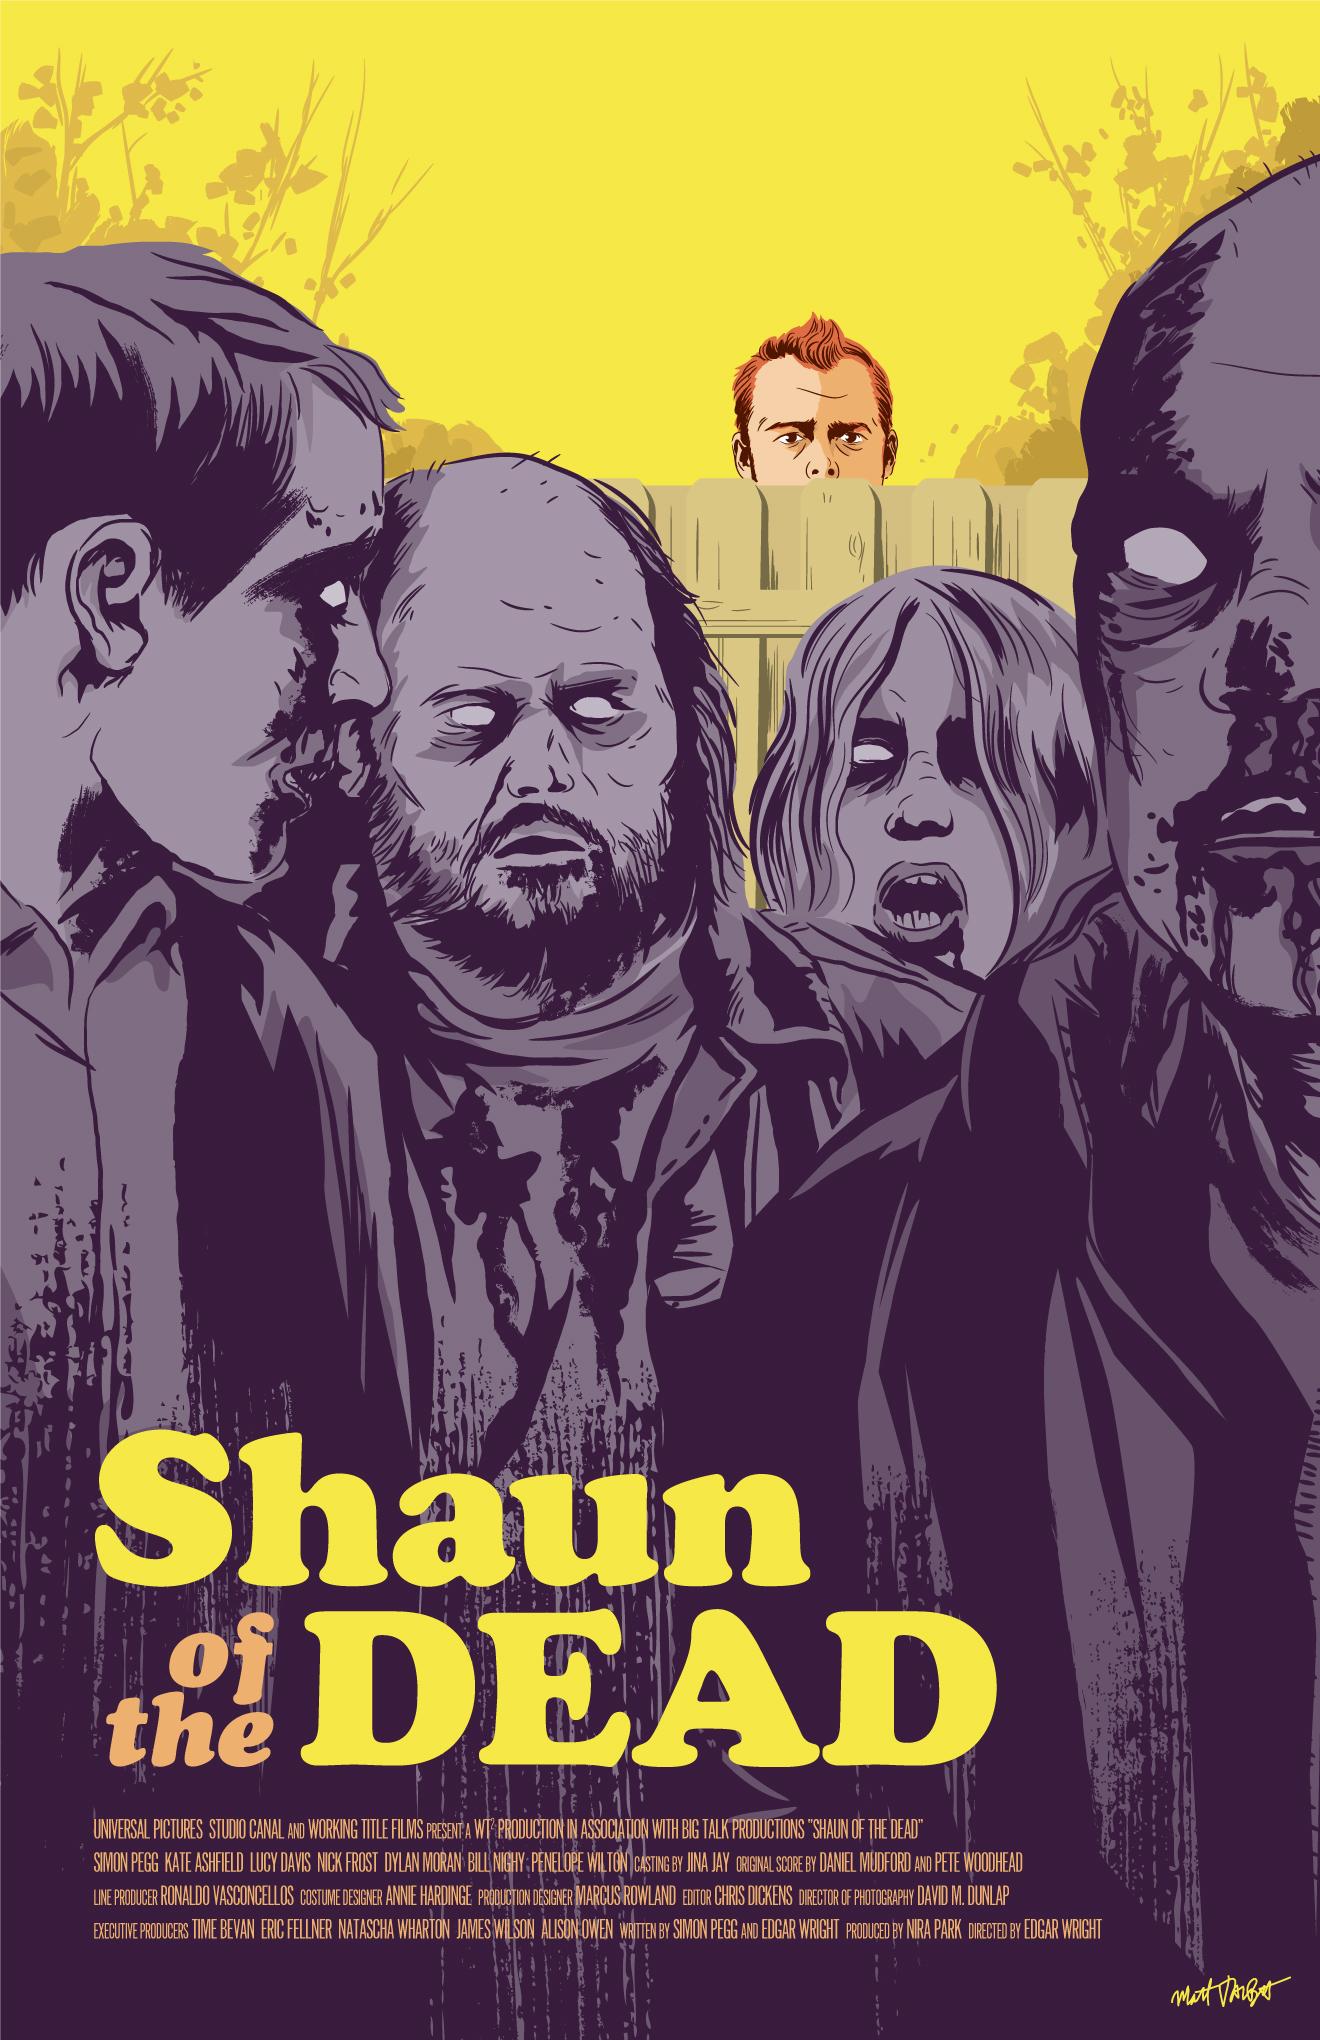 Shaun of the Dead poster by Matt Talbot